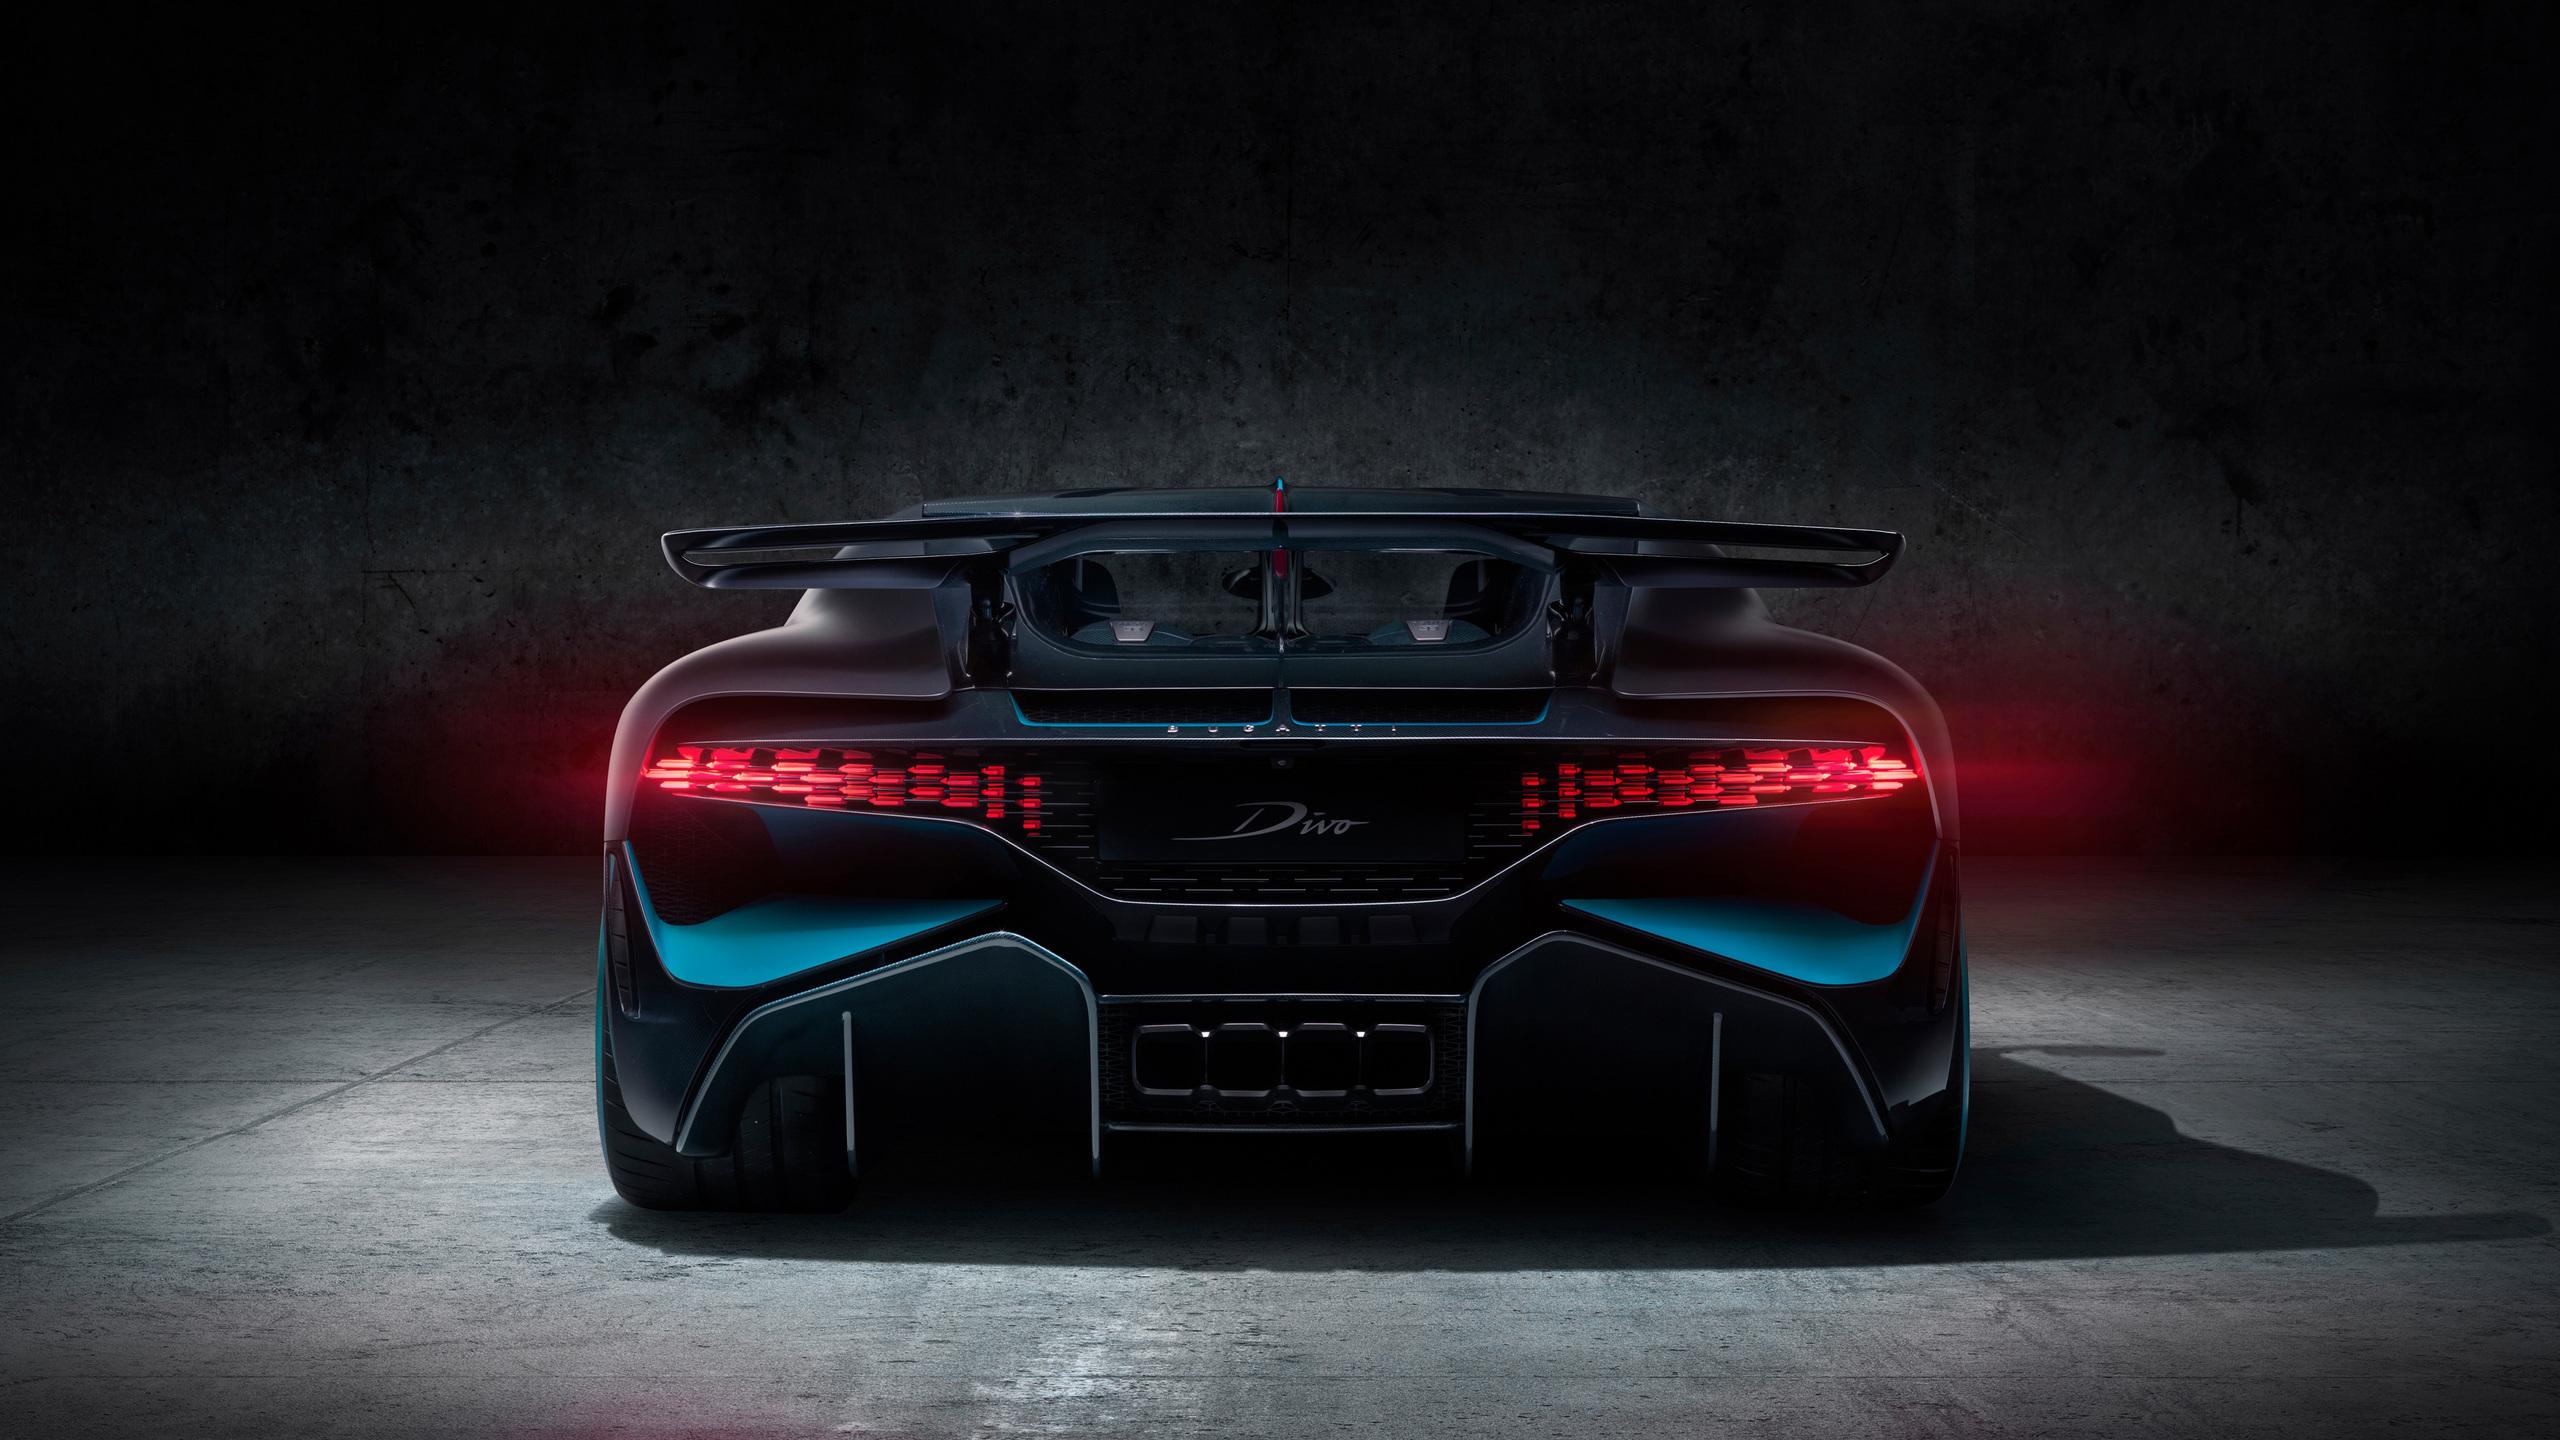 2560x1440 Bugatti Divo 2018 Rear 1440P Resolution HD 4k ...